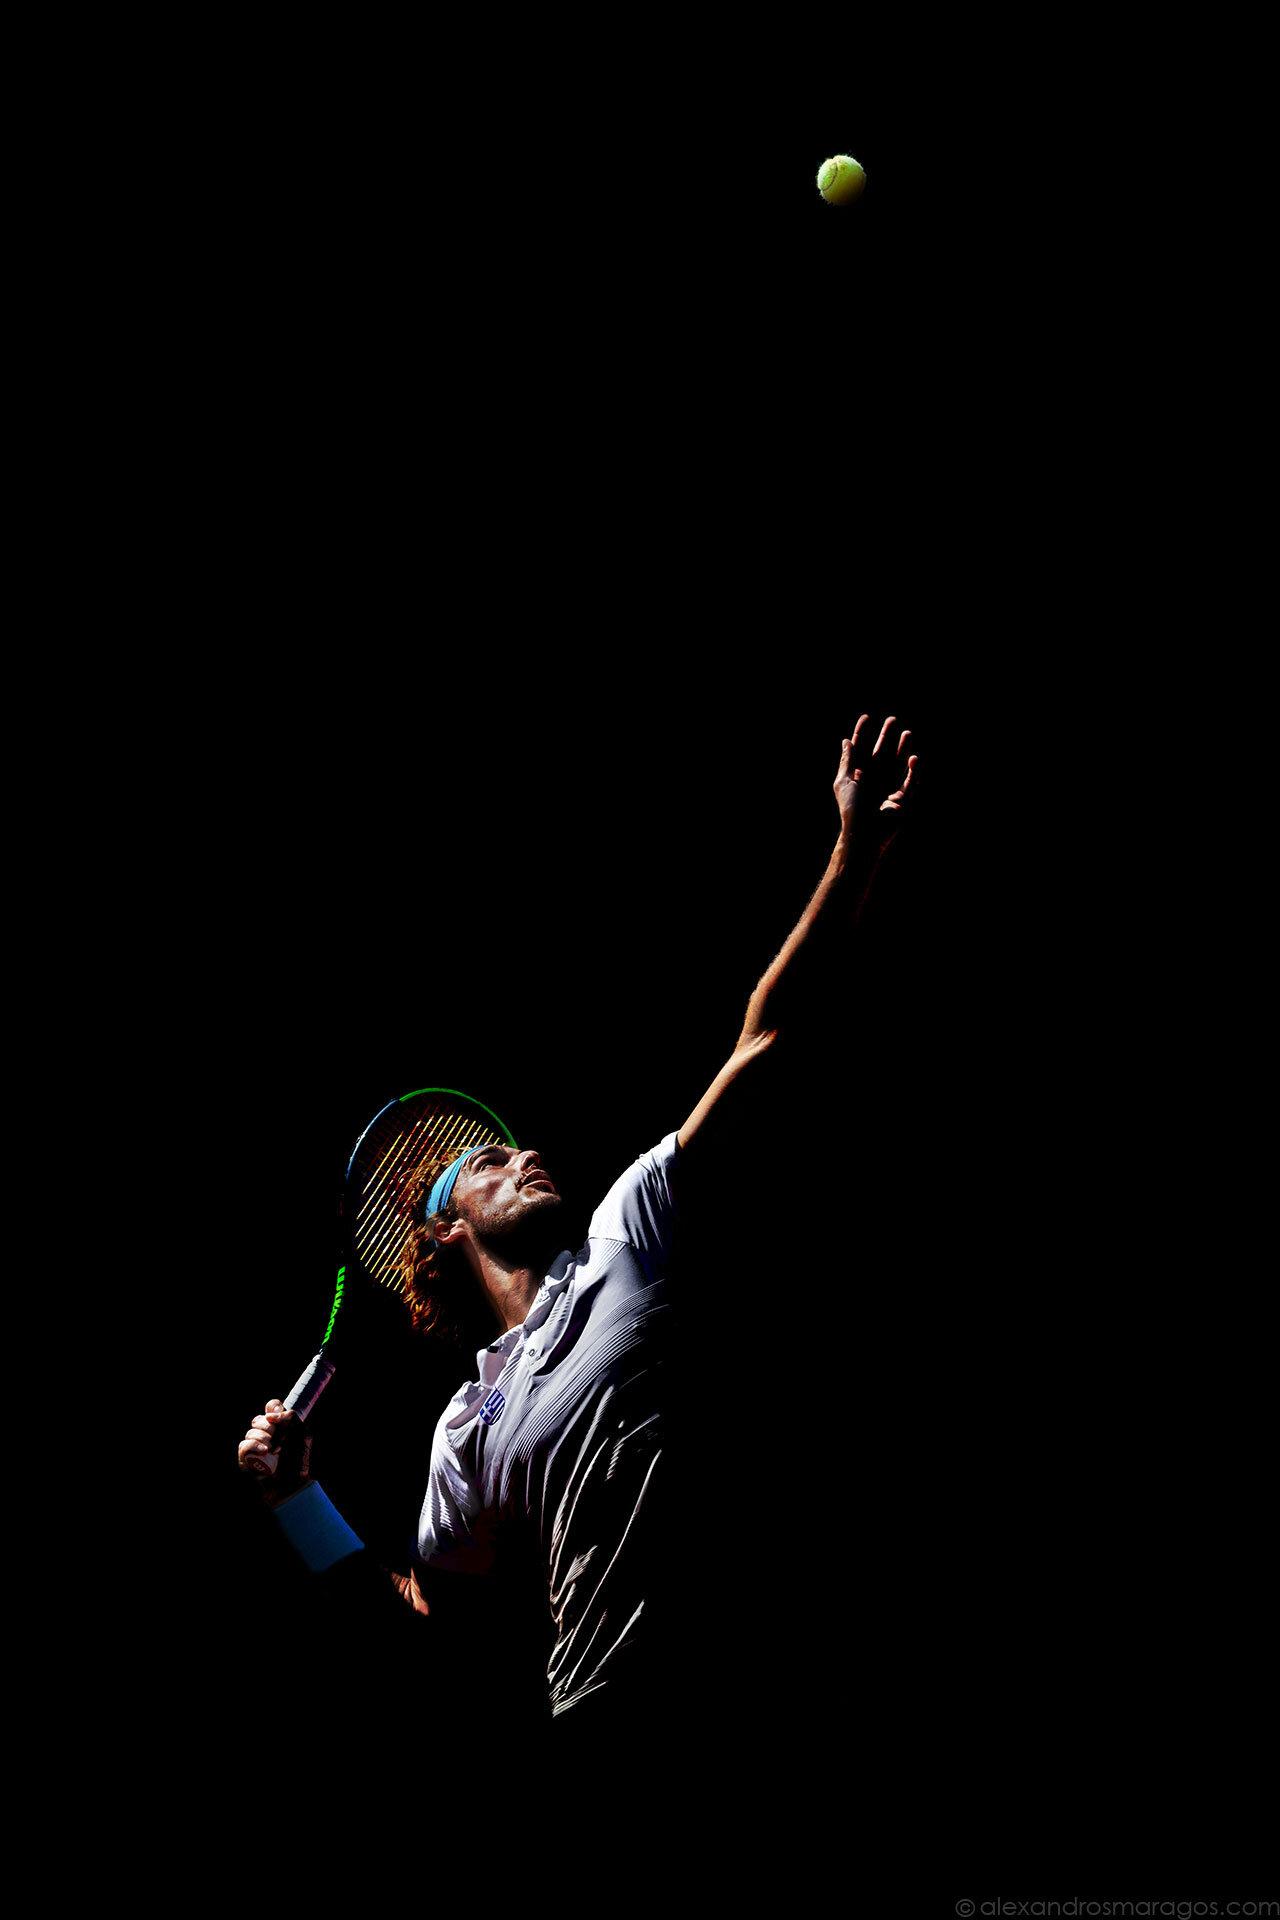 Stefanos Tsitsipas Photographed by Alexandros Maragos